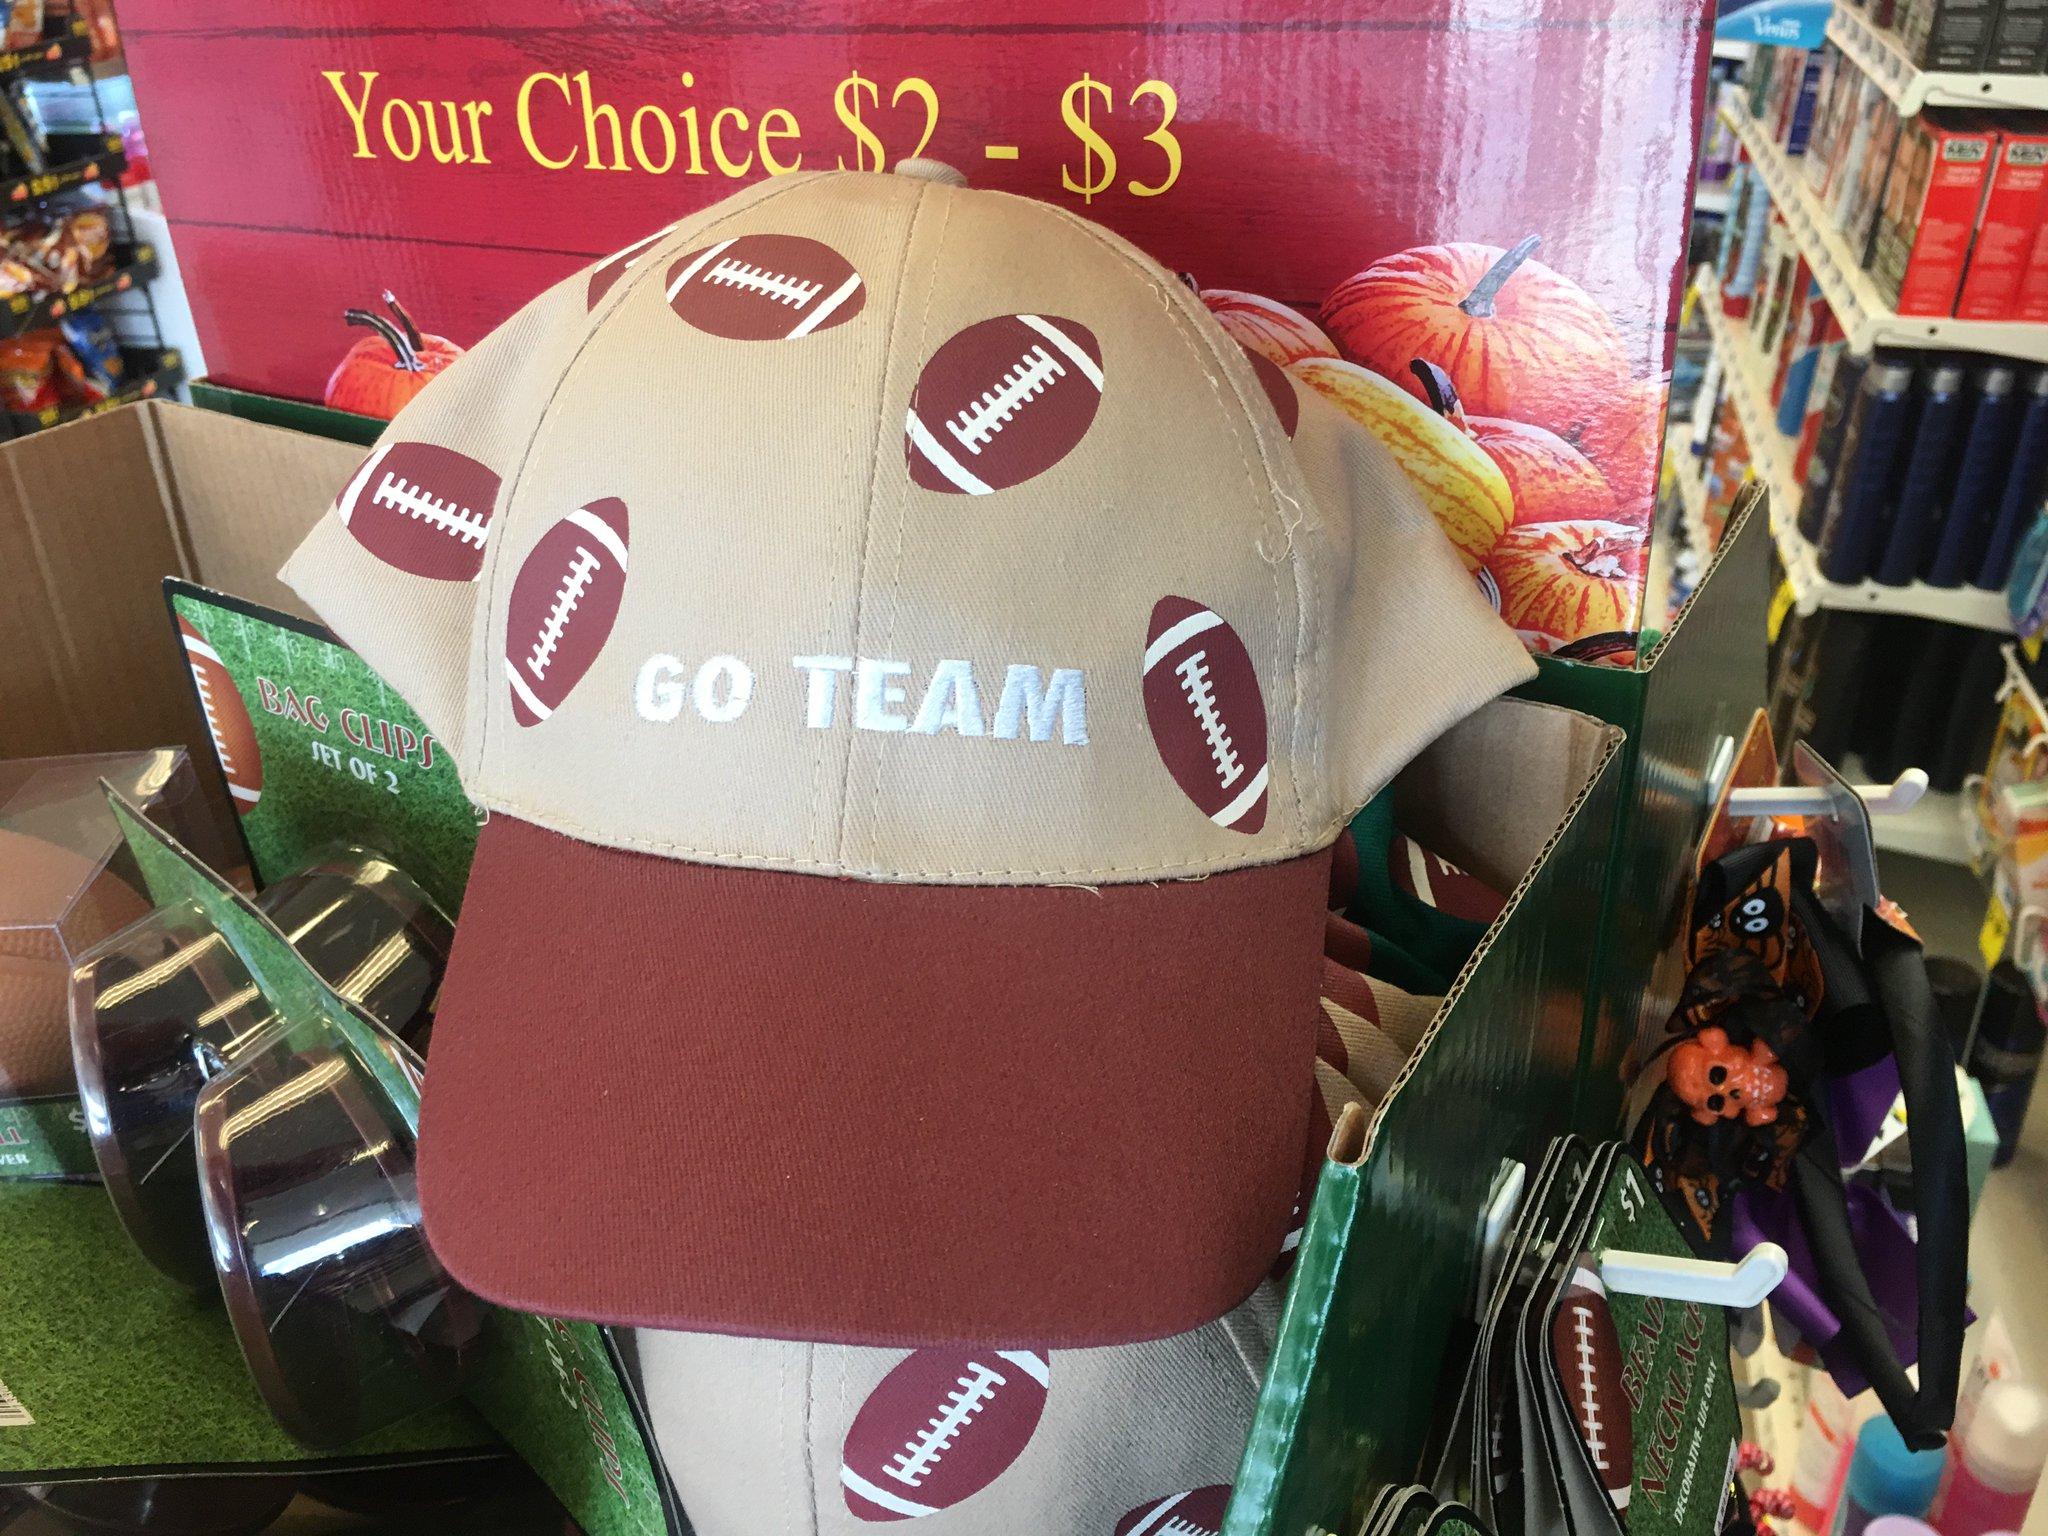 Found my new football-watchin' hat. https://t.co/RAekFRL1xK